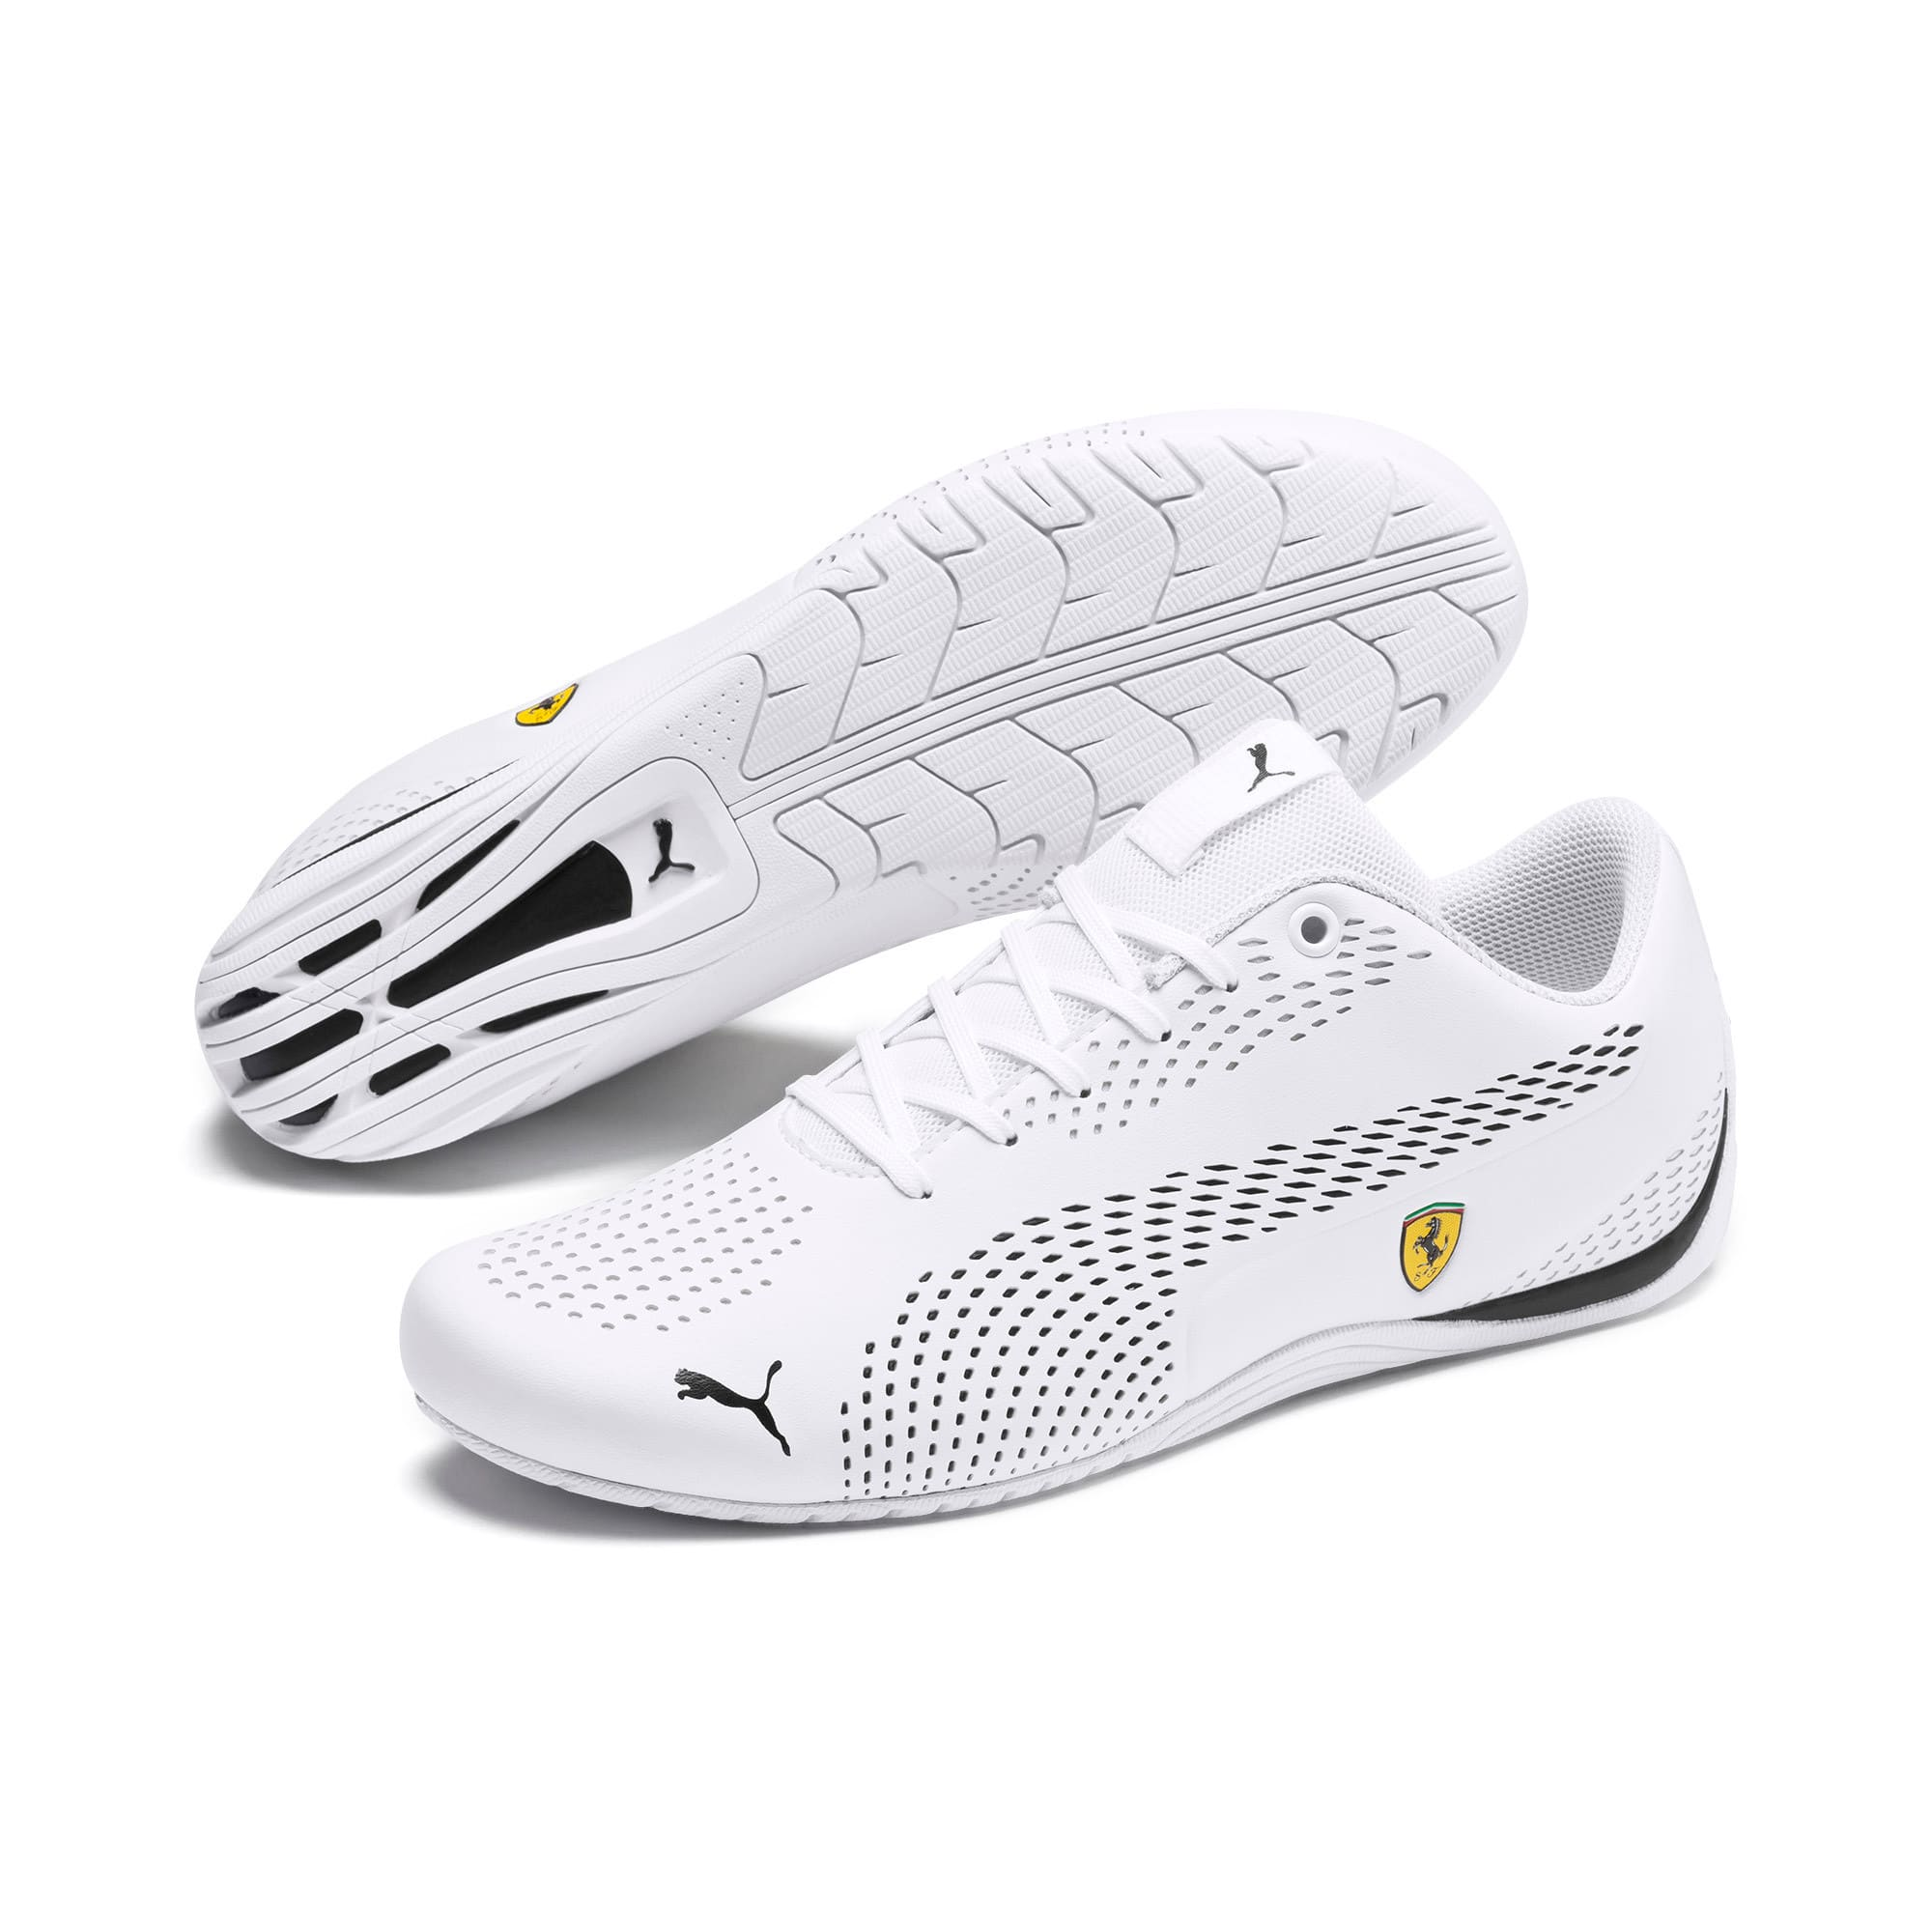 Thumbnail 3 of Scuderia Ferrari Drift Cat 5 Ultra II Men's Shoes, Puma White-Puma Black, medium